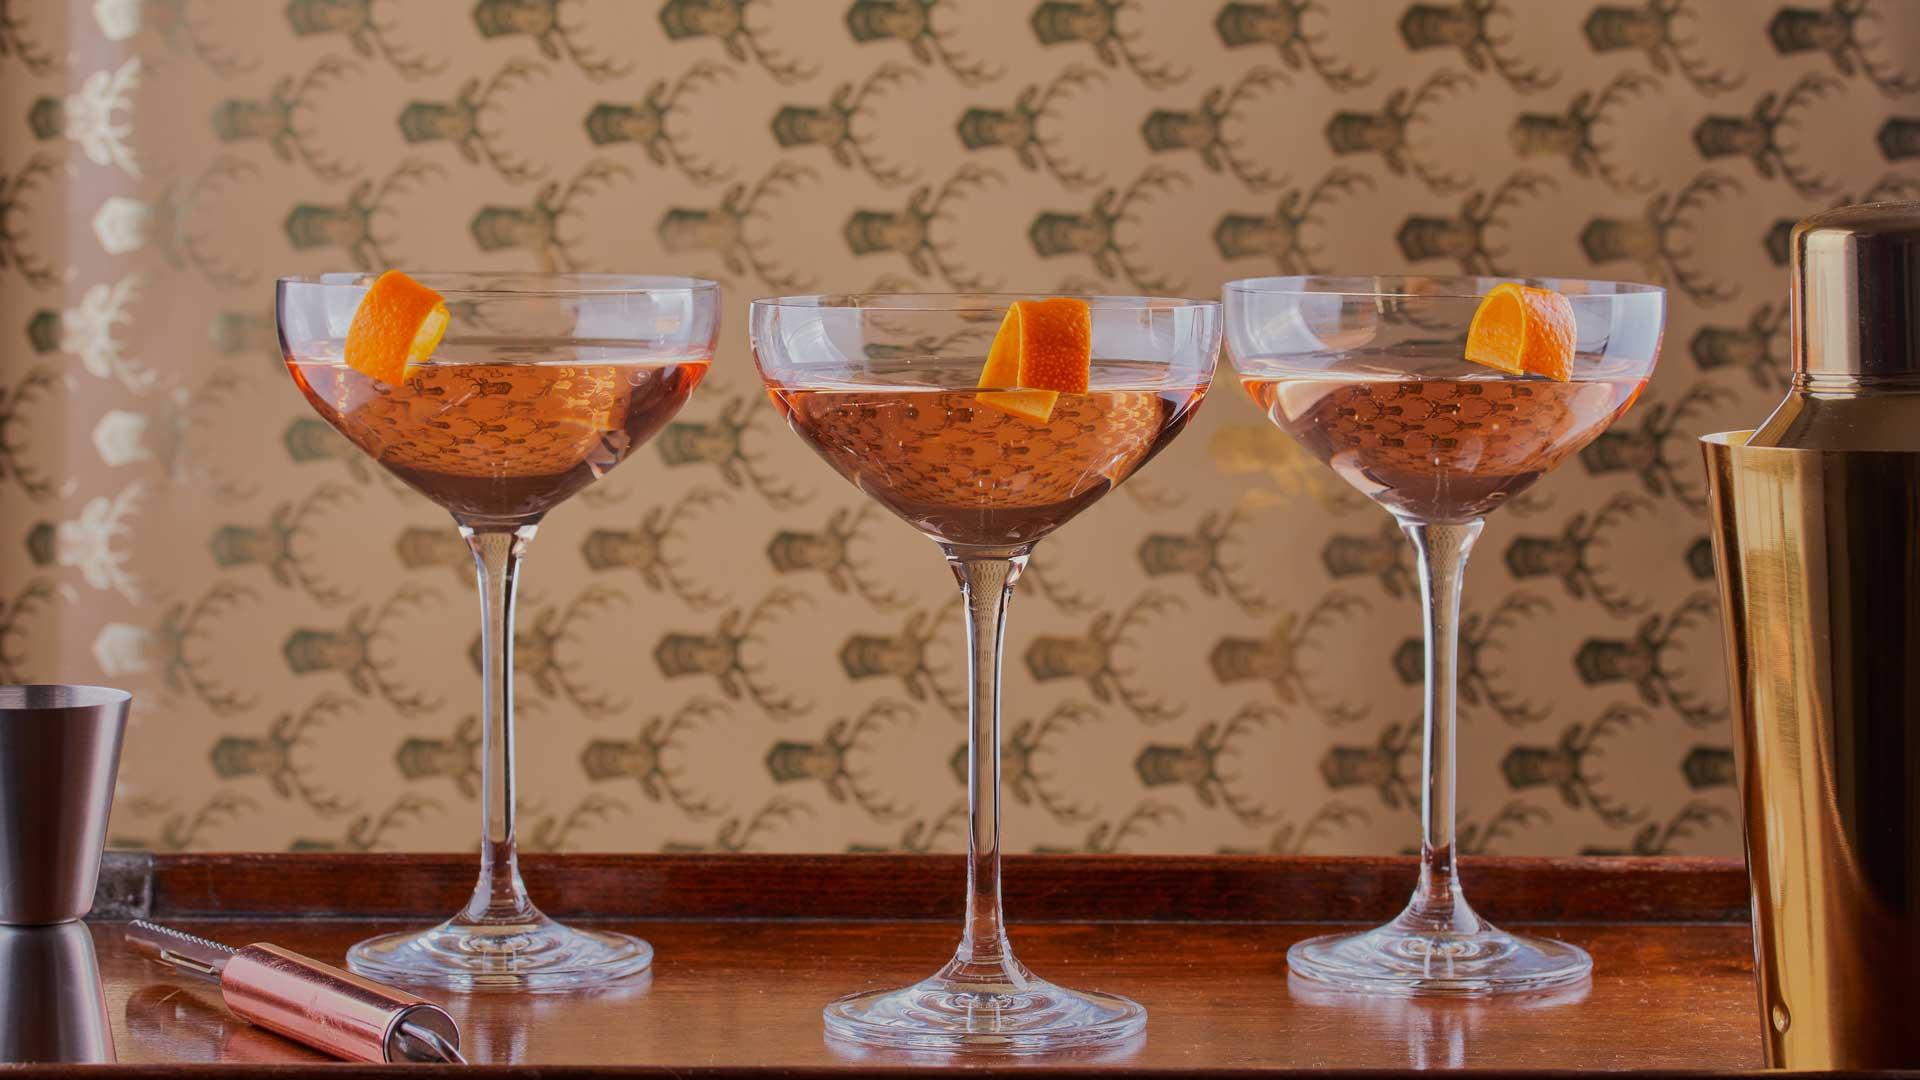 El-presidente-cocktail-ricetta-storia-ingredienti-Coqtail-Milano